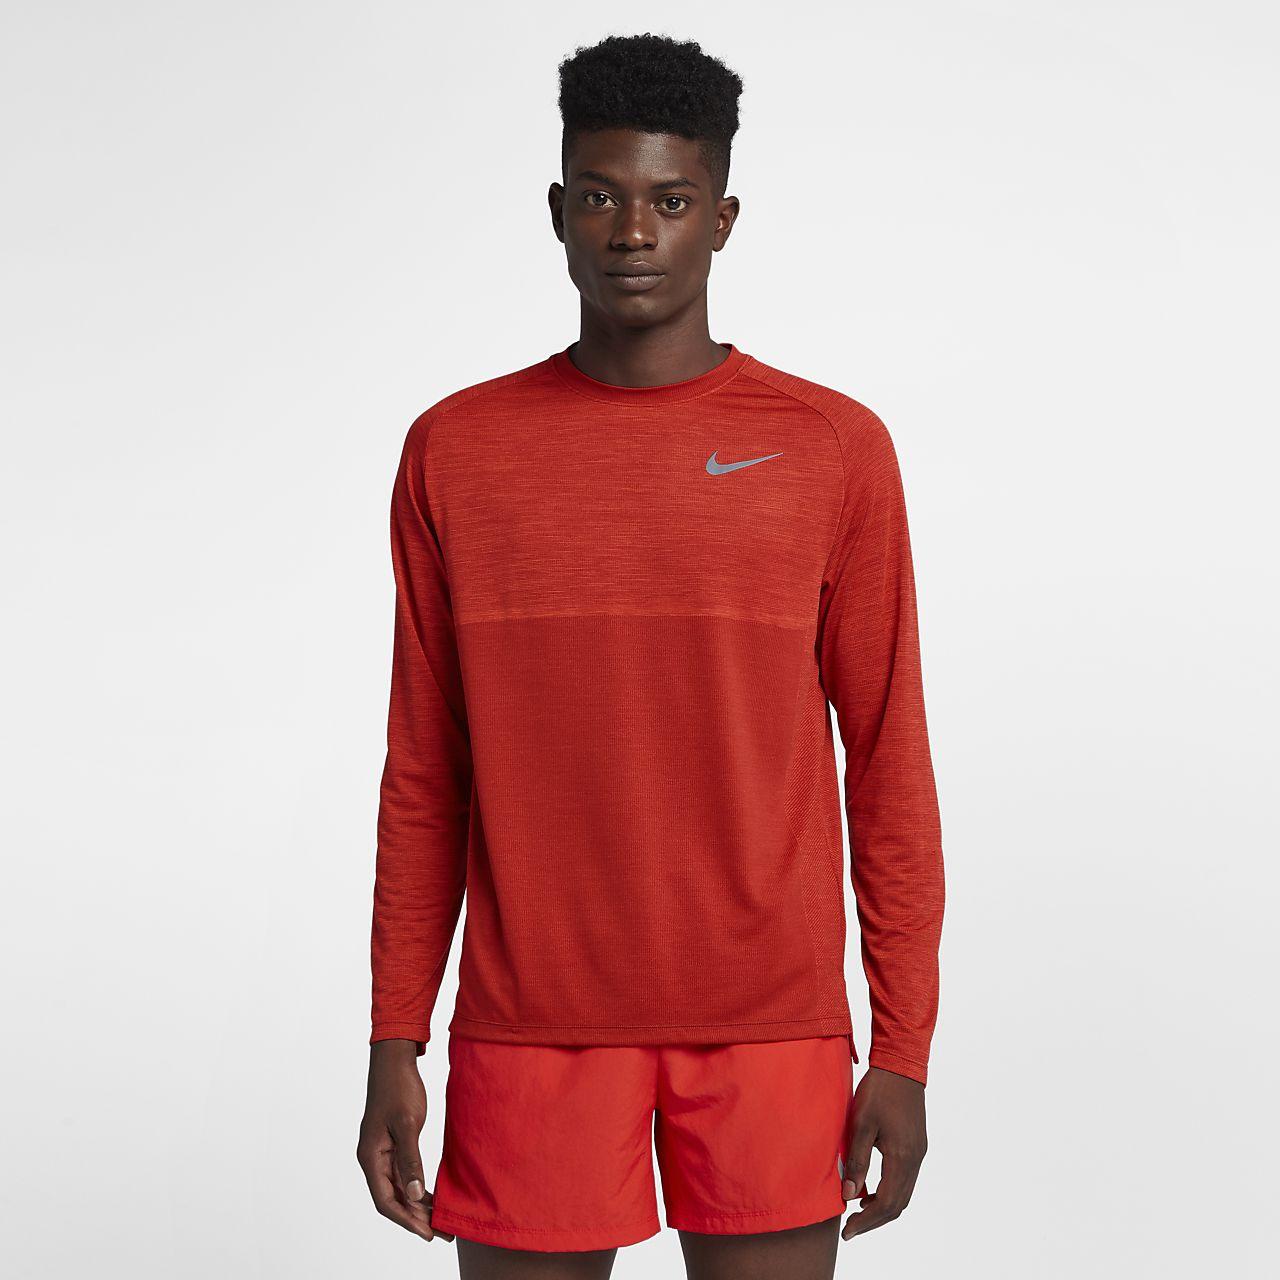 8defa1248 Nike Orange Long Sleeve Compression Shirt - DREAMWORKS